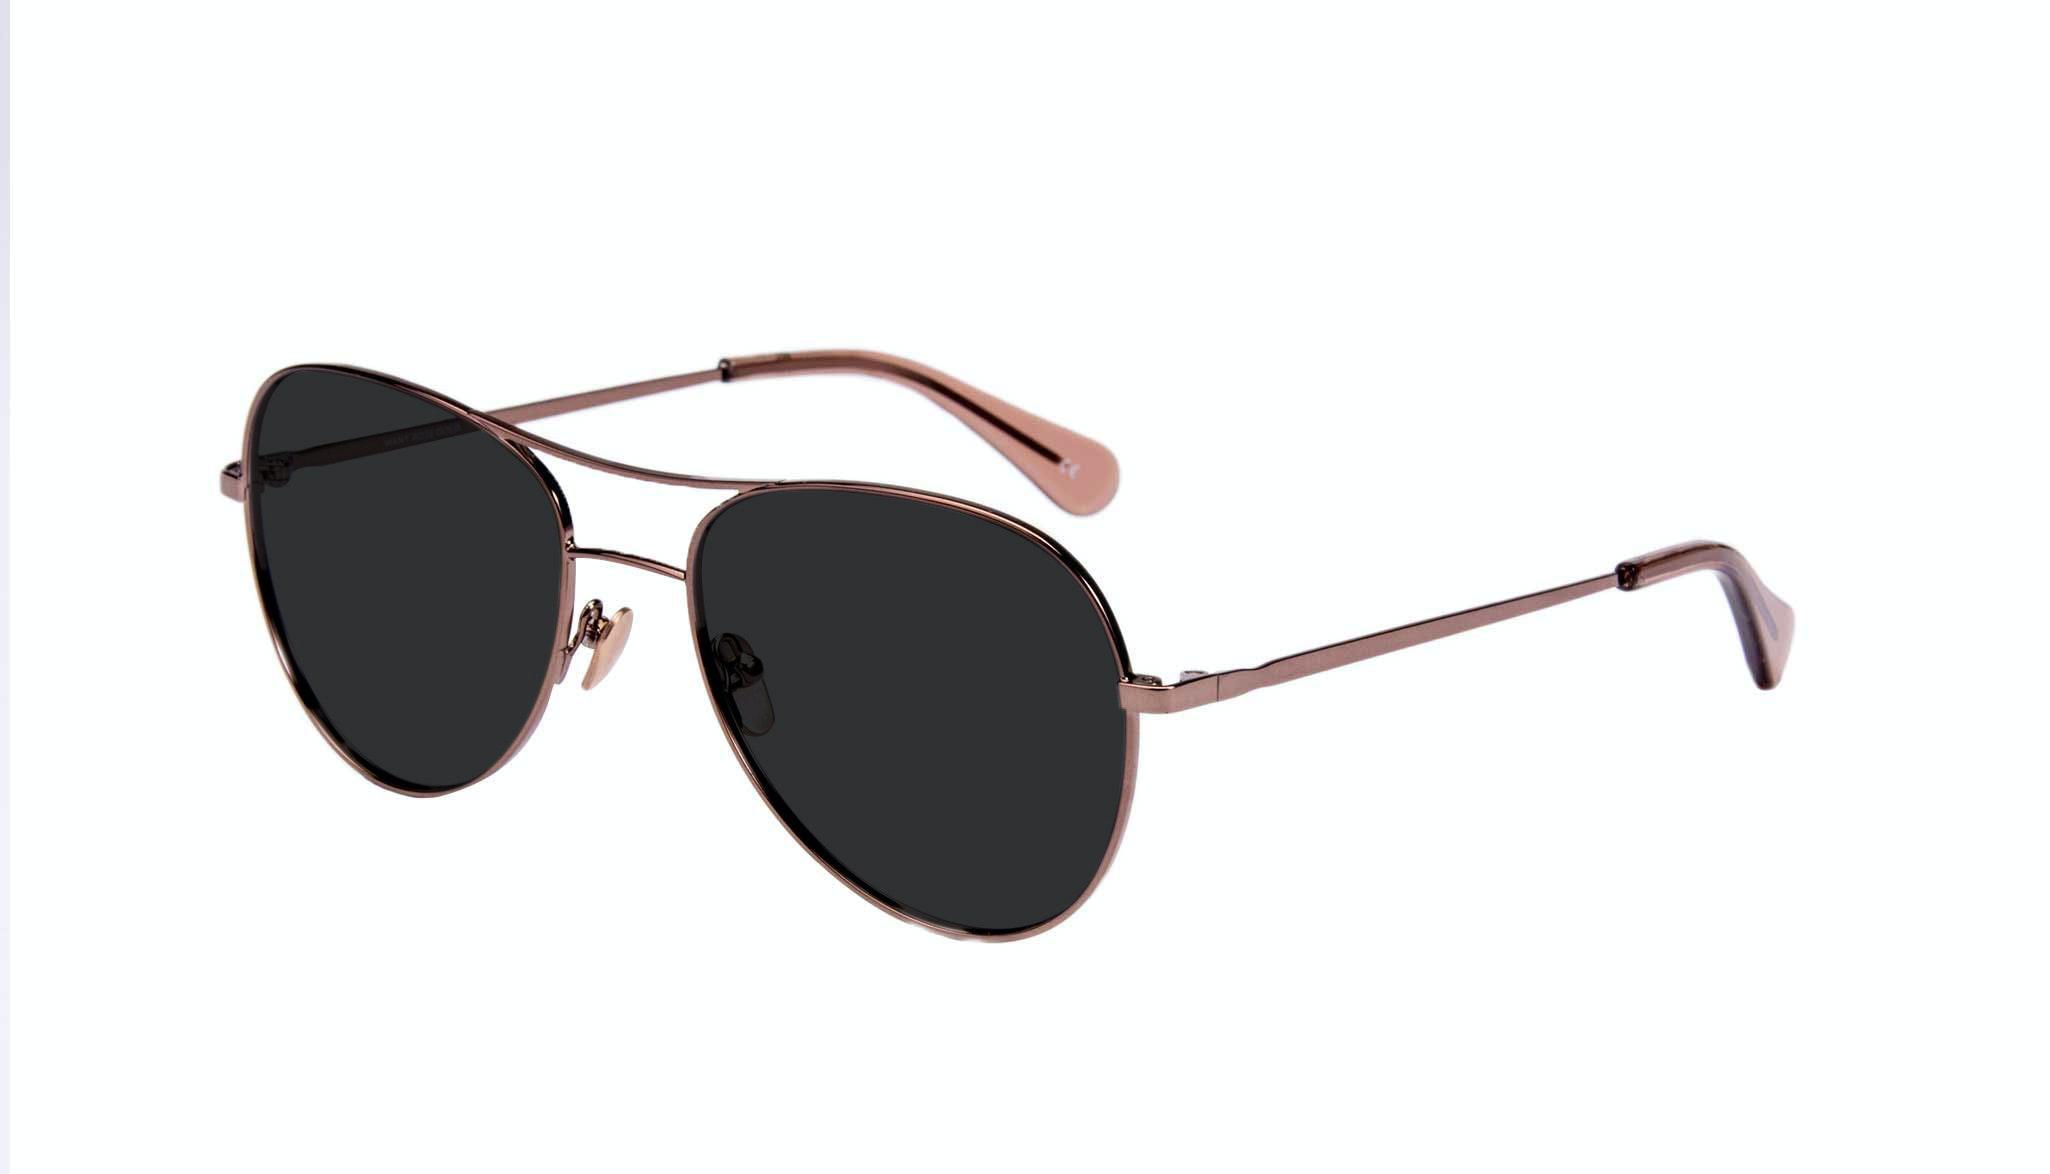 Affordable Fashion Glasses Aviator Sunglasses Women Want Rose Gold Tilt